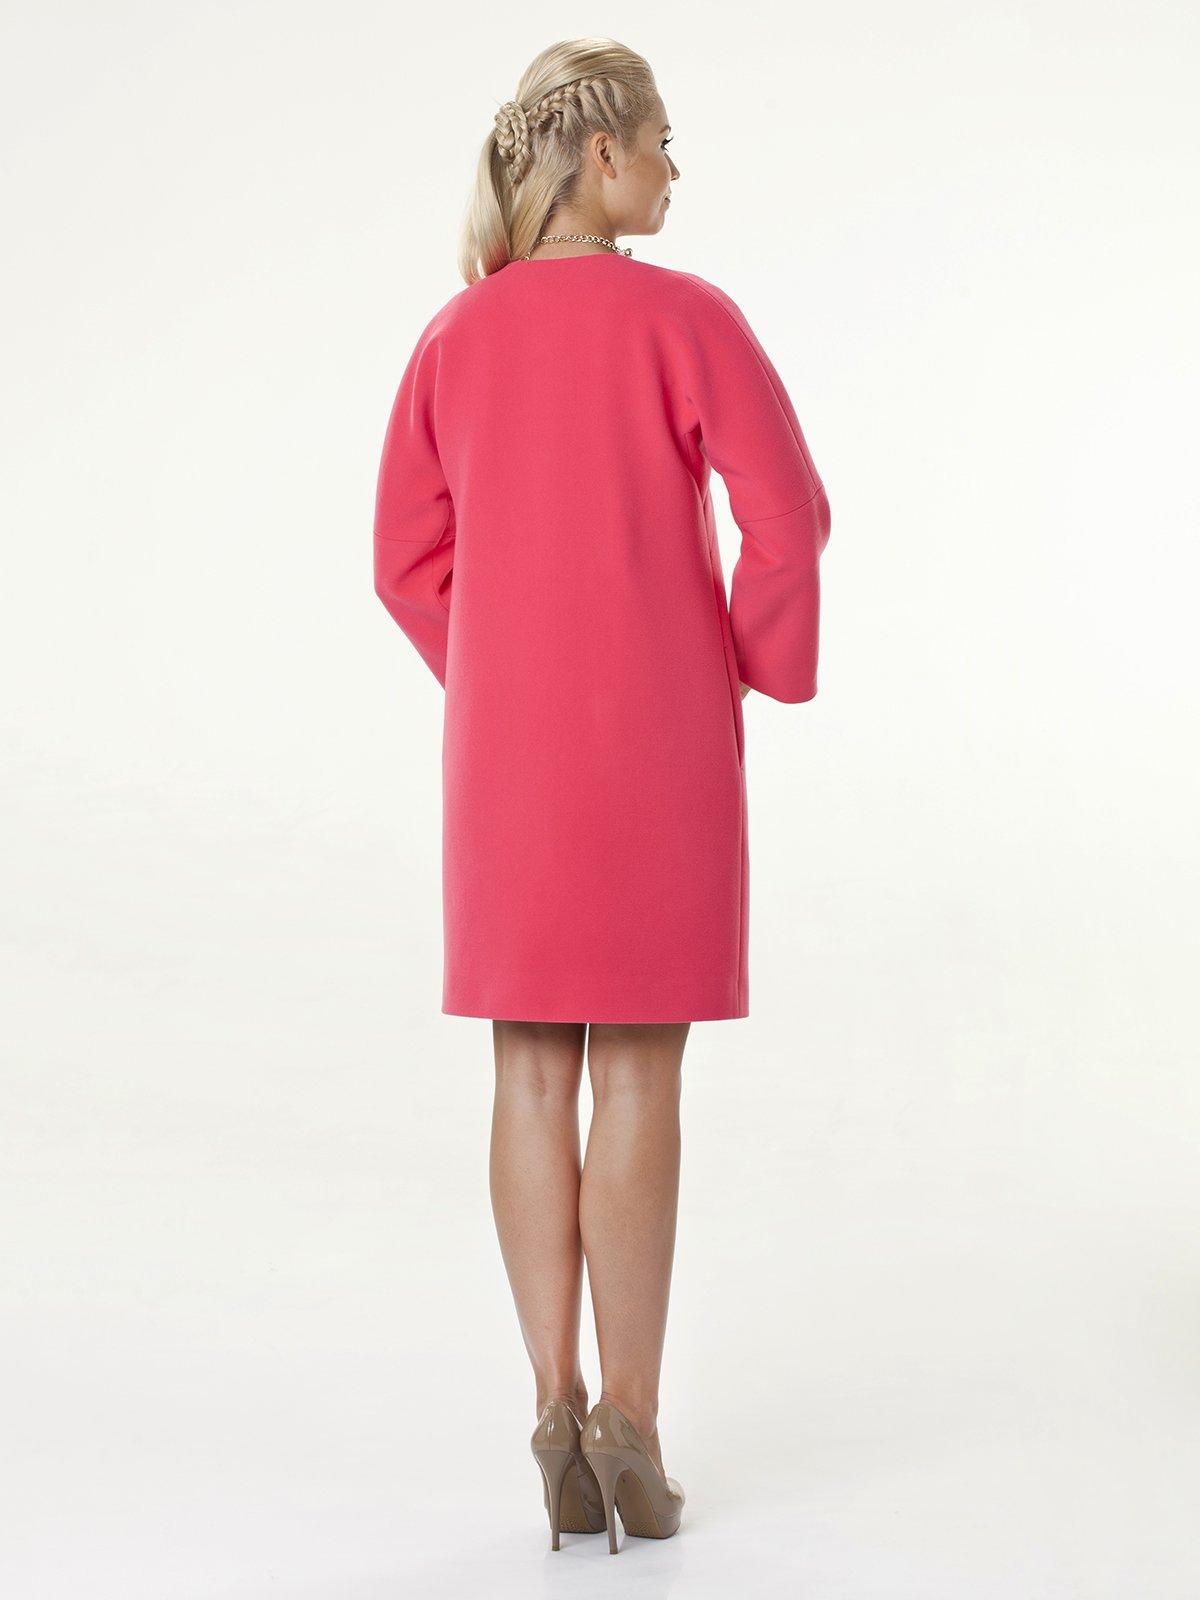 Пальто розовое | 2074798 | фото 4